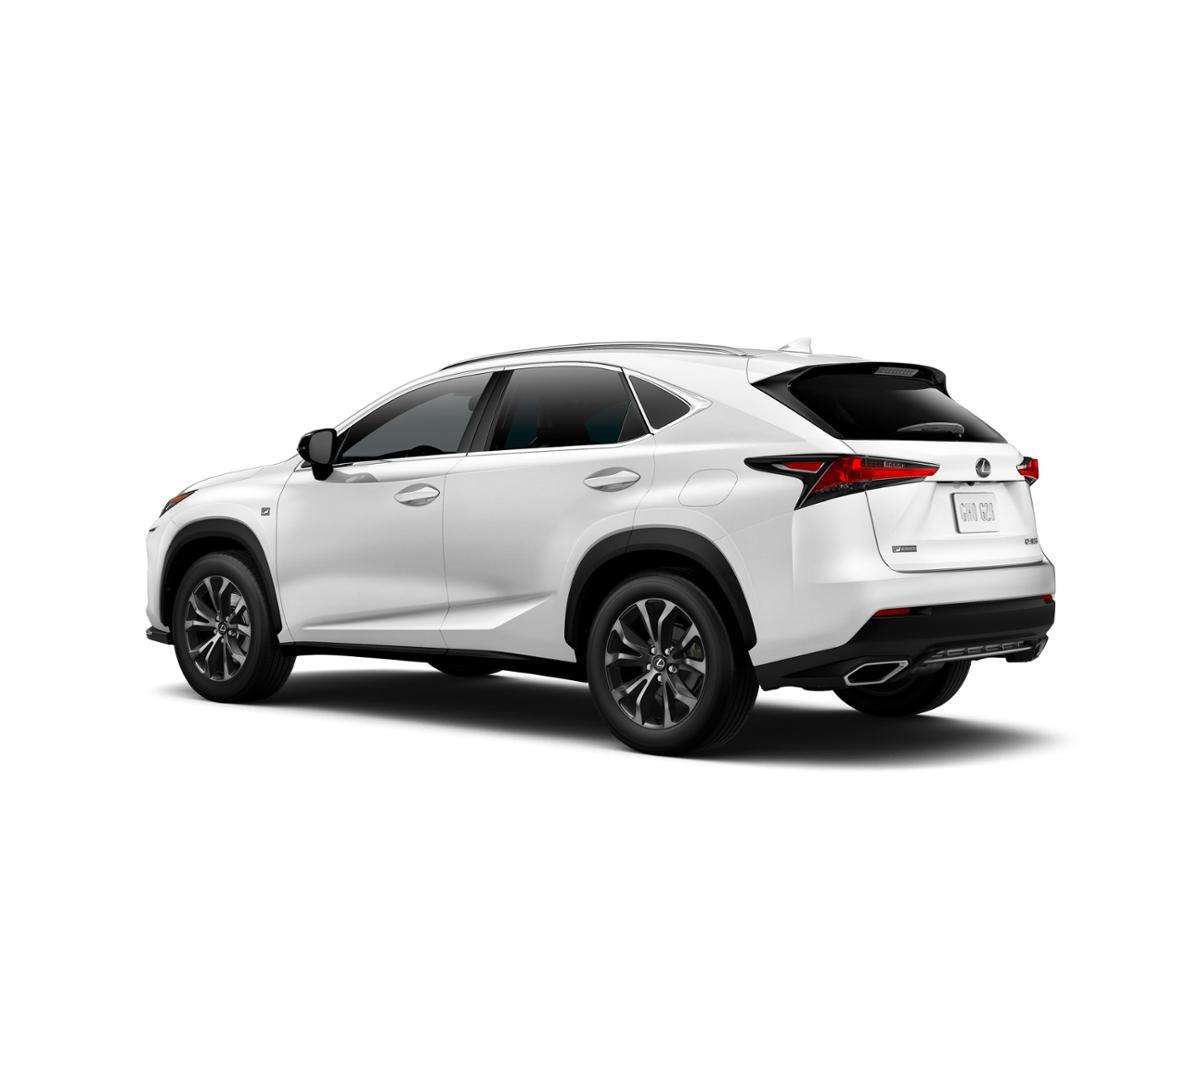 2018 Ultra White F SPORT Lexus NX 300 For Sale In San